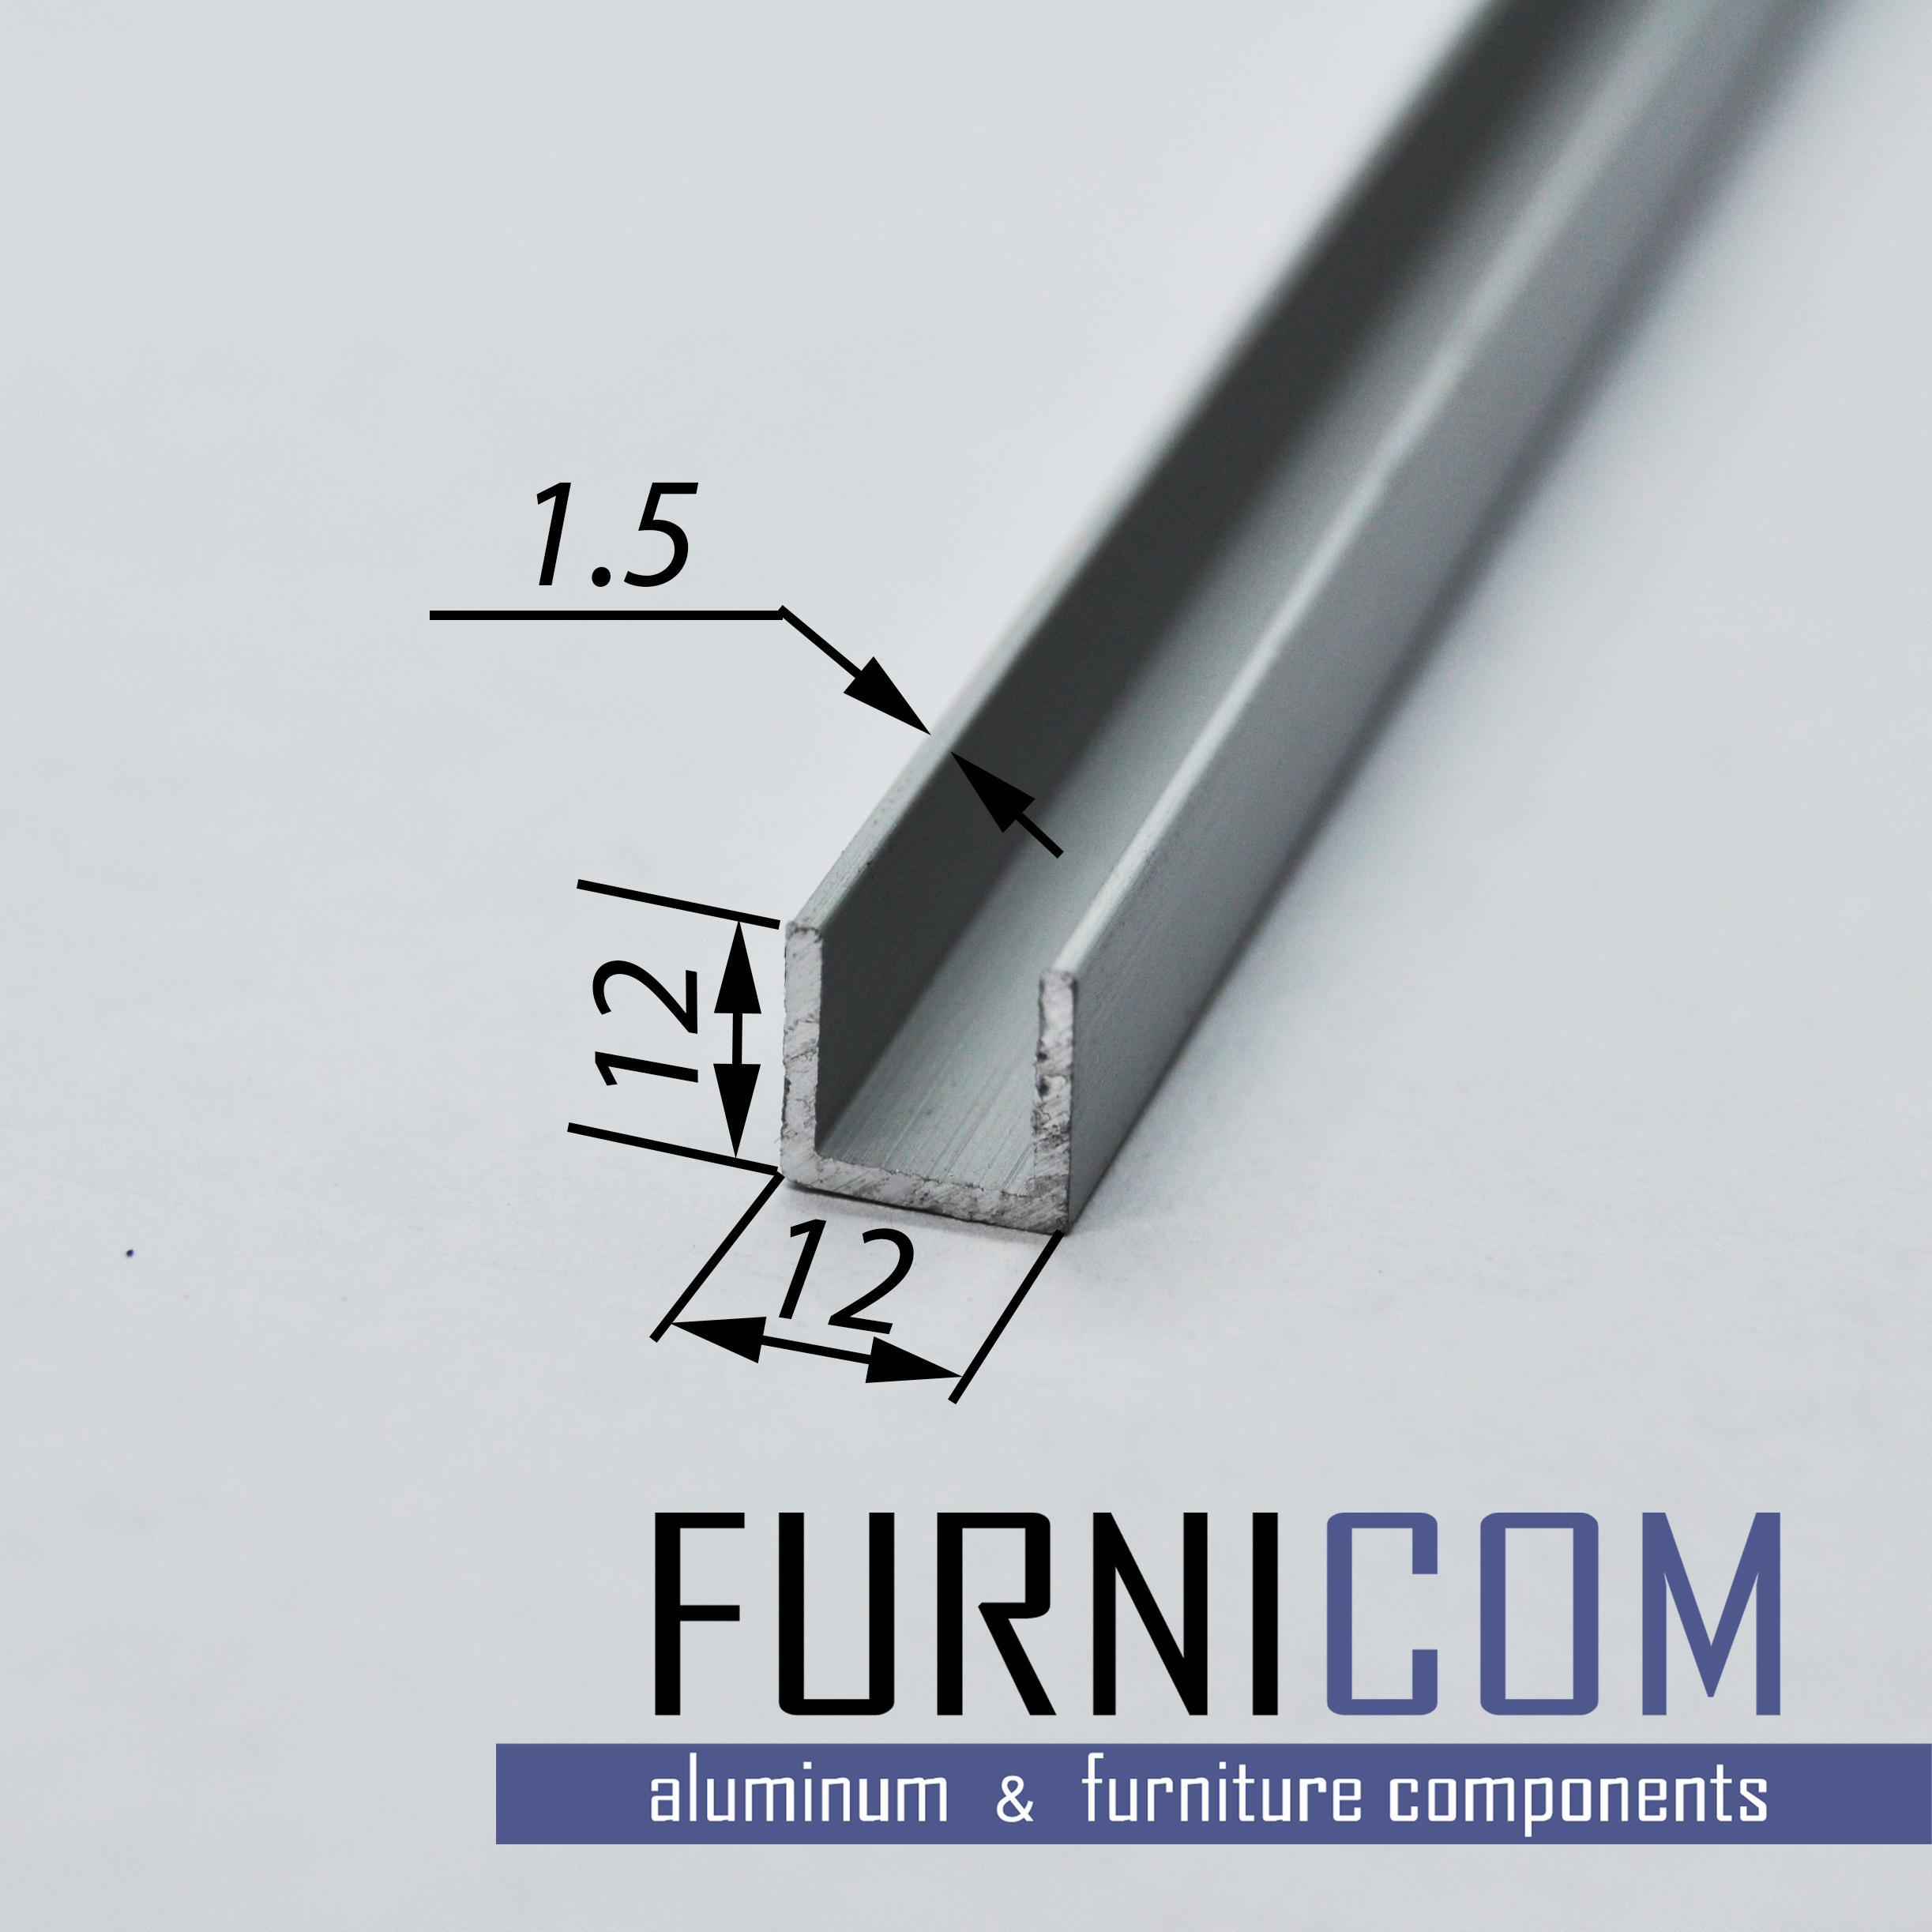 Швеллер алюминиевый 12х12х1.5 / б.п.